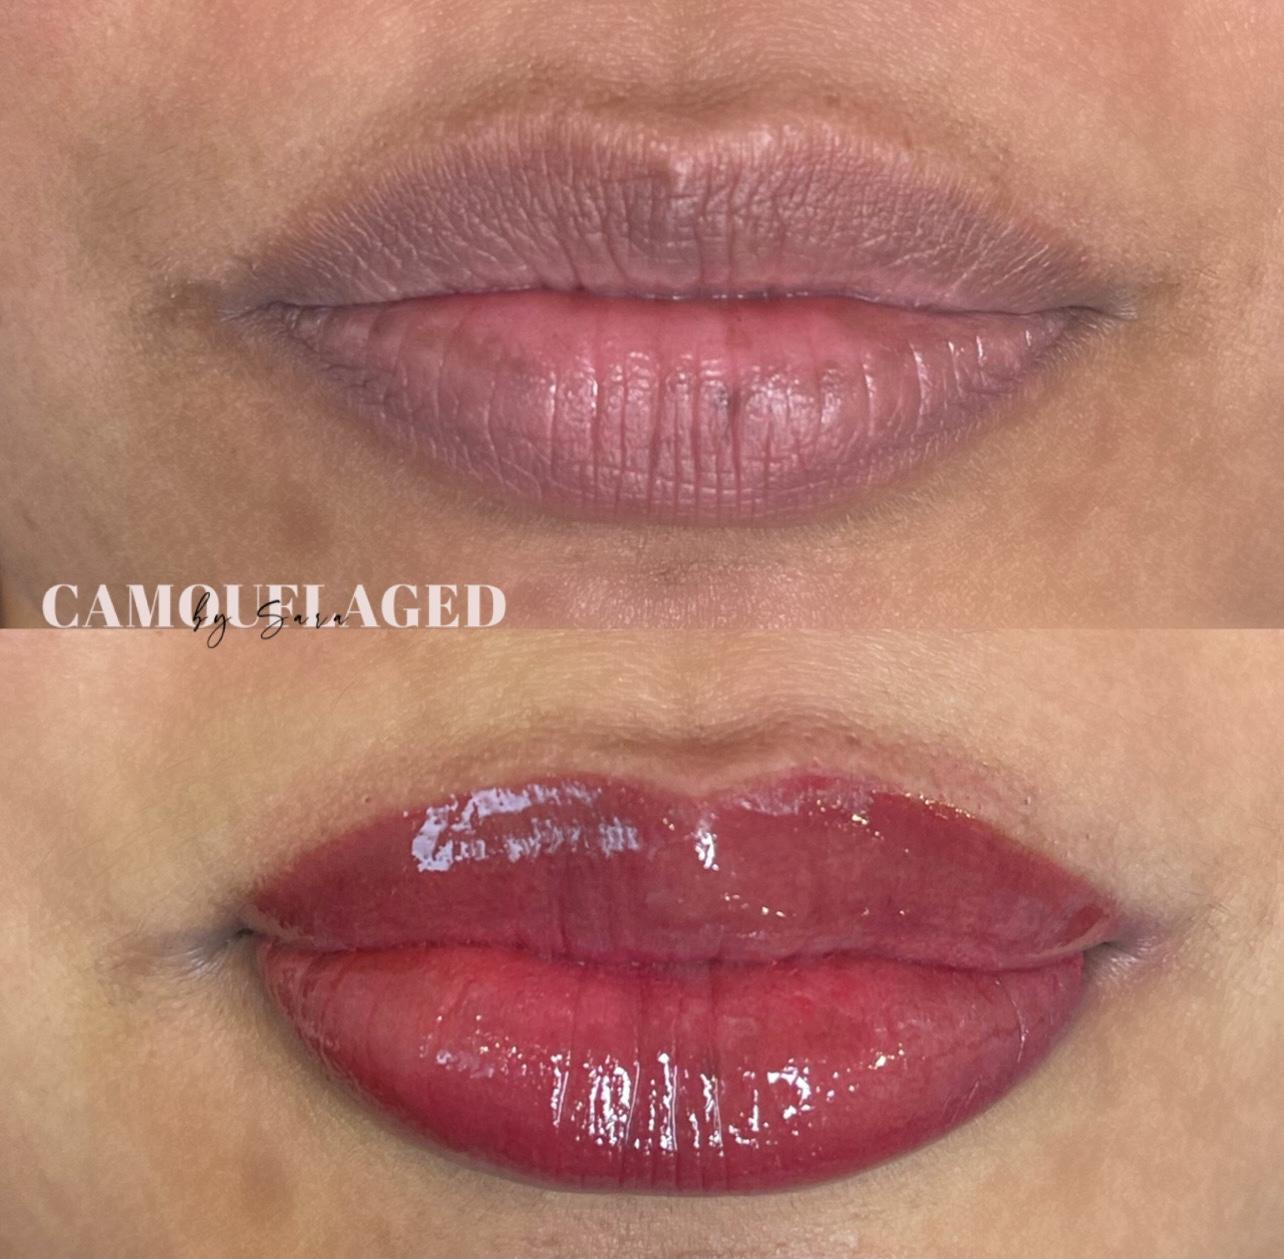 Lip Blushing in massachusetts